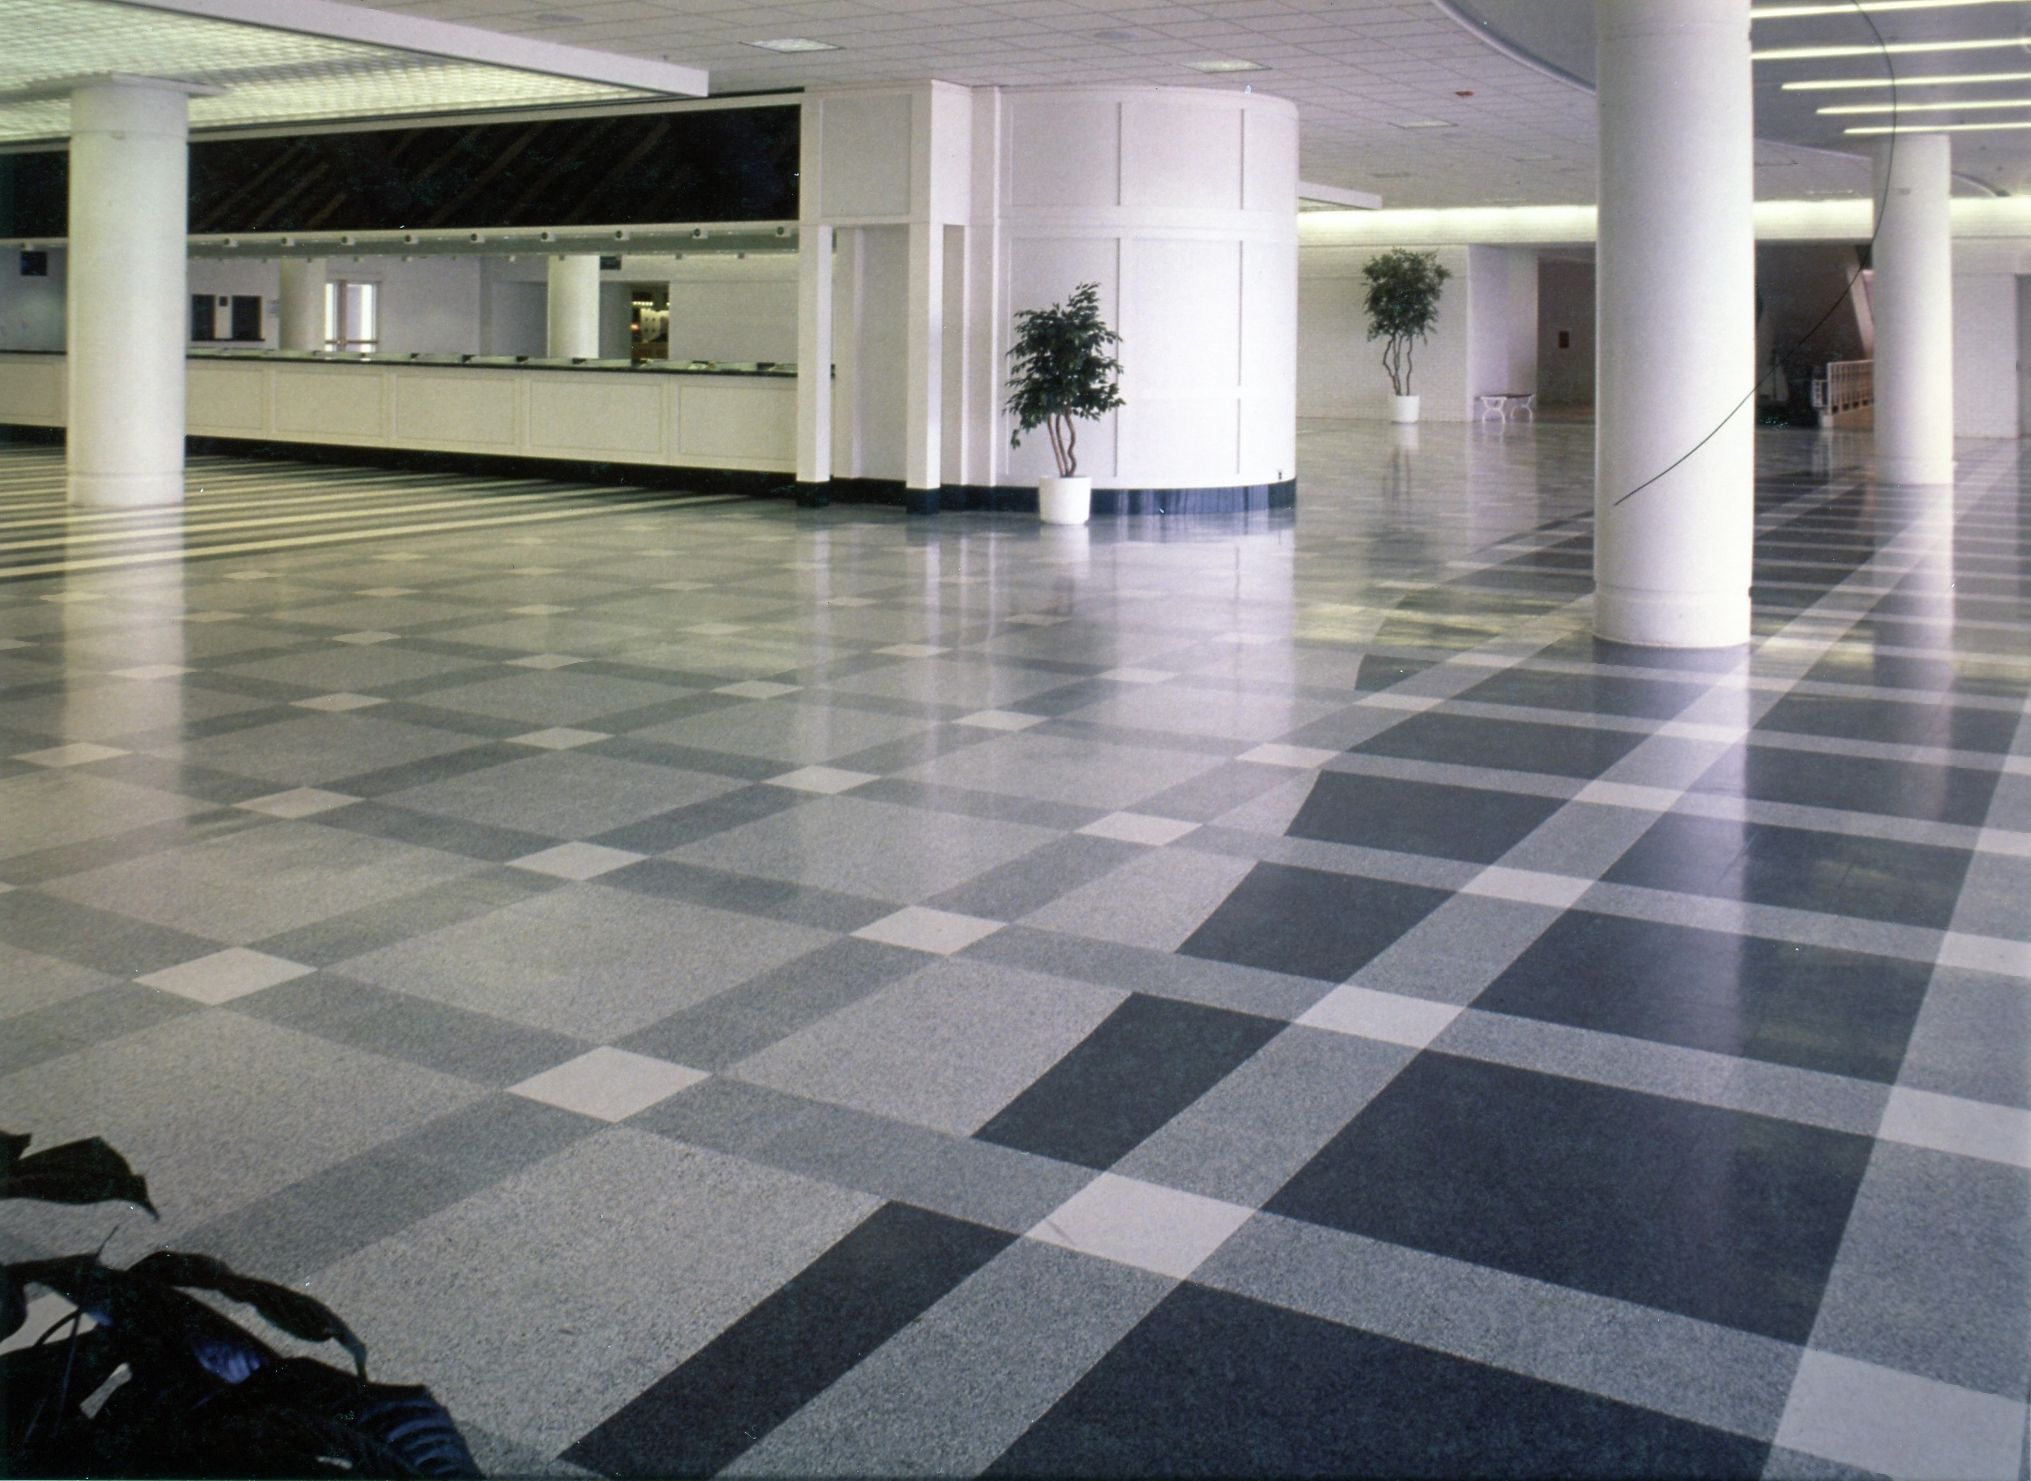 Fritztile #Terrazzo #Tile #Flooring #cafeteria | Educational ...